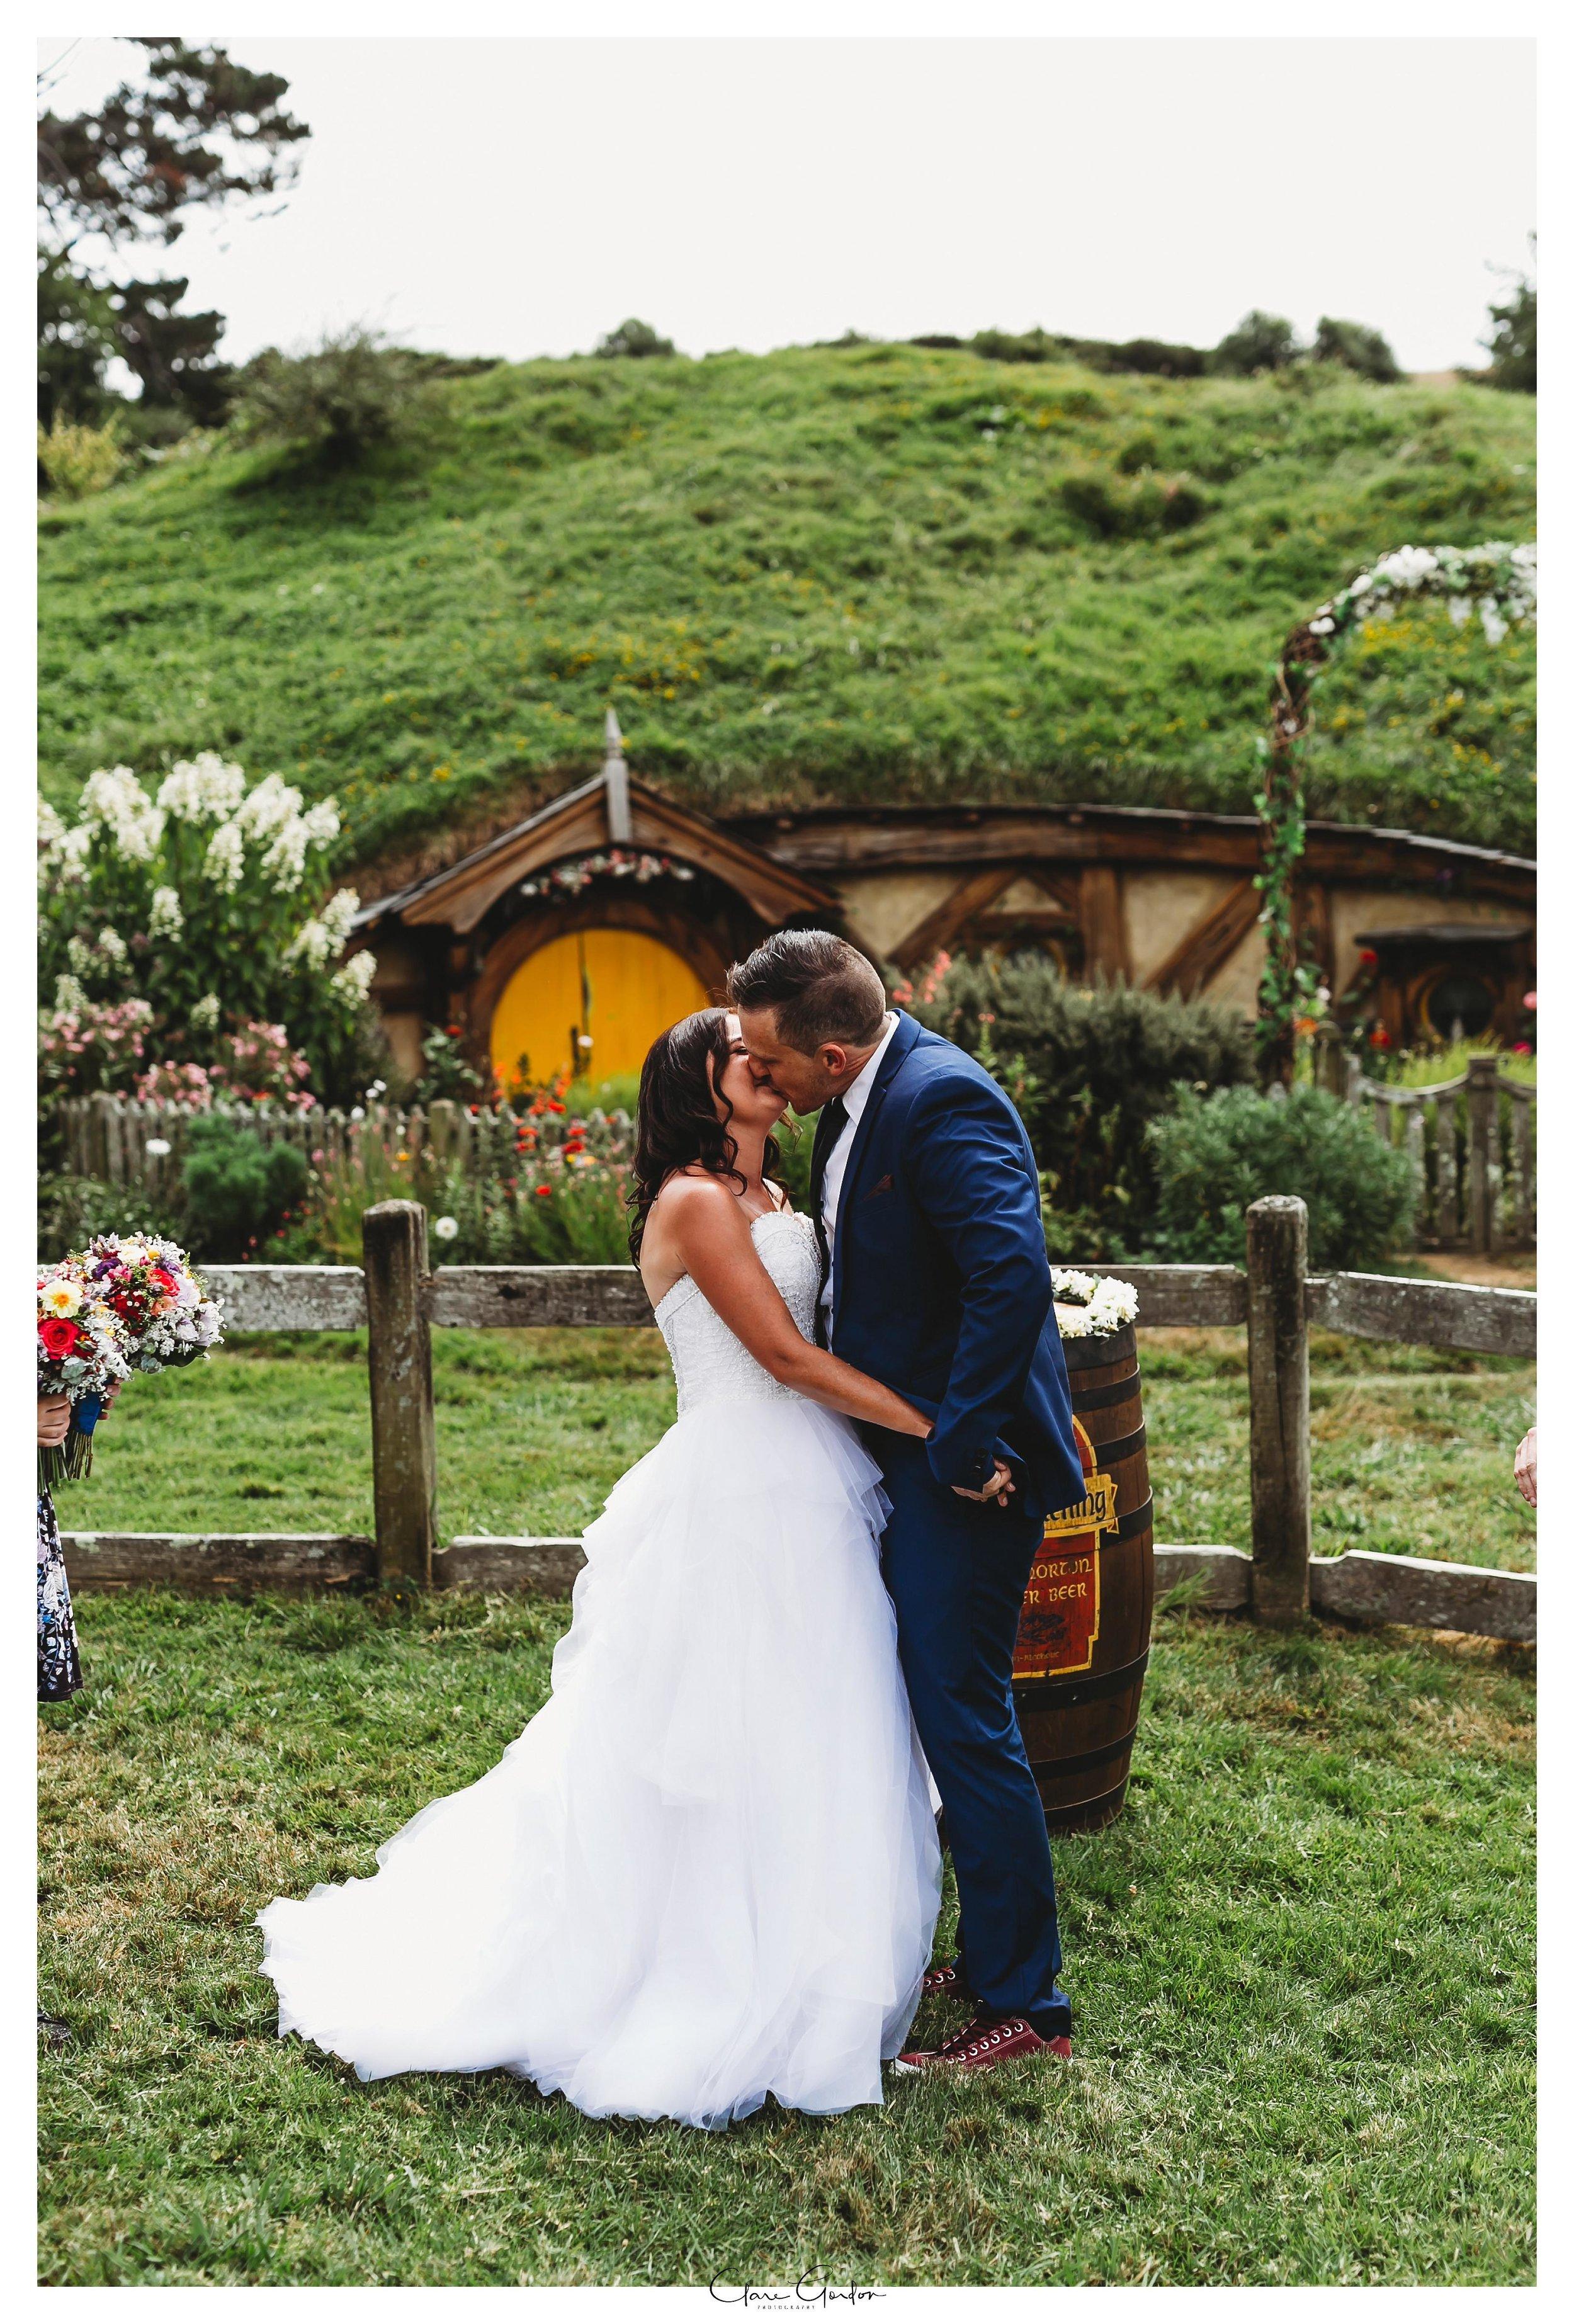 Hobbiton-wedding-bride-and-groom-kiss